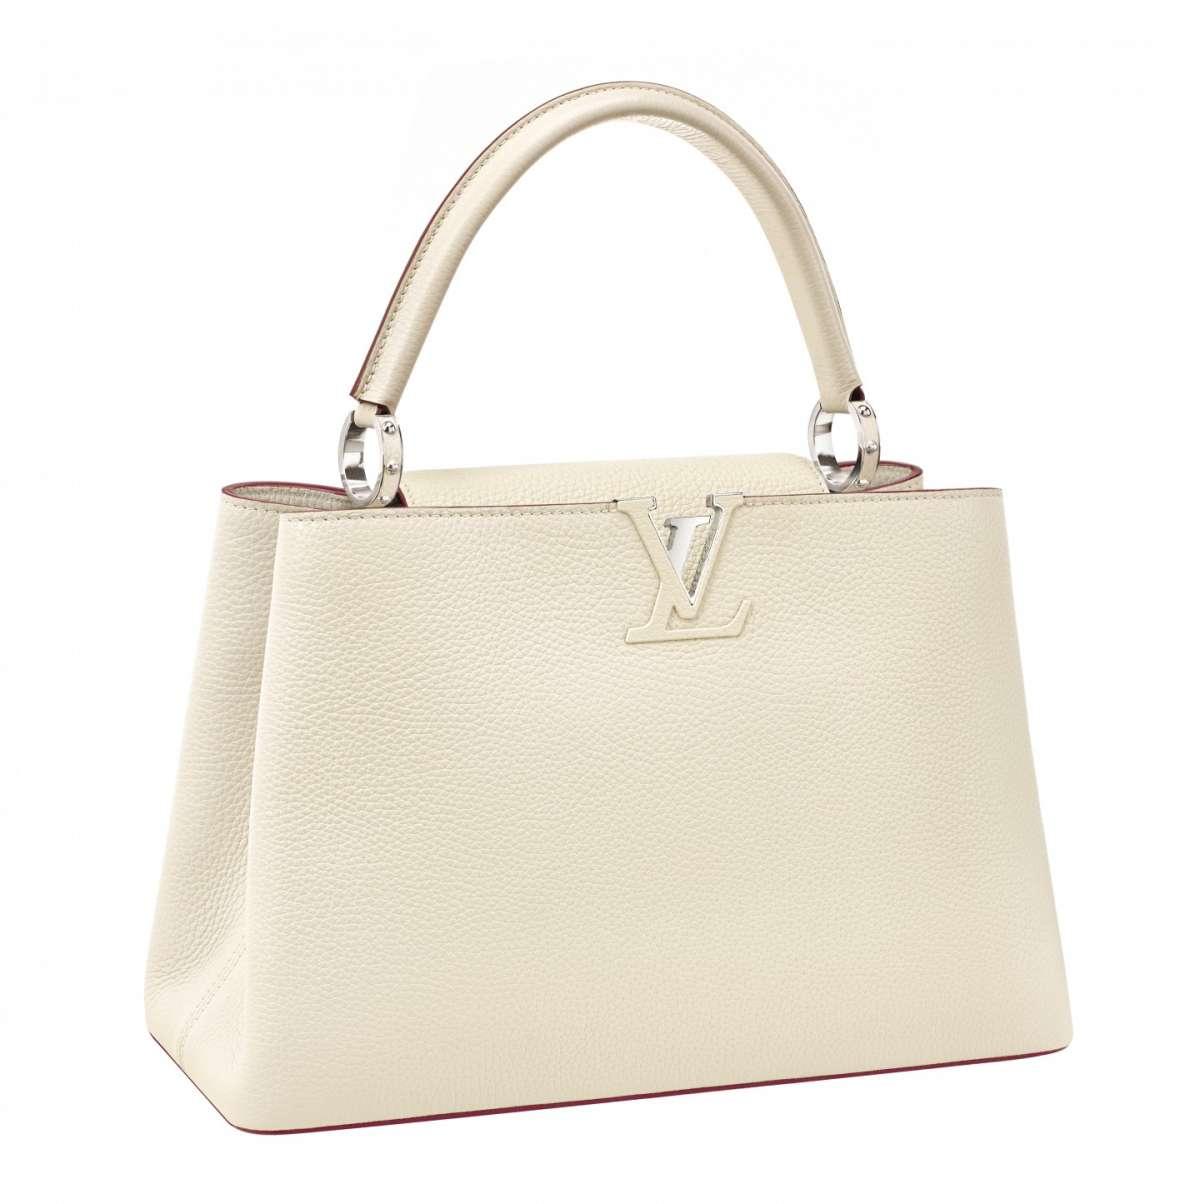 Handbag avorio Louis Vuitton